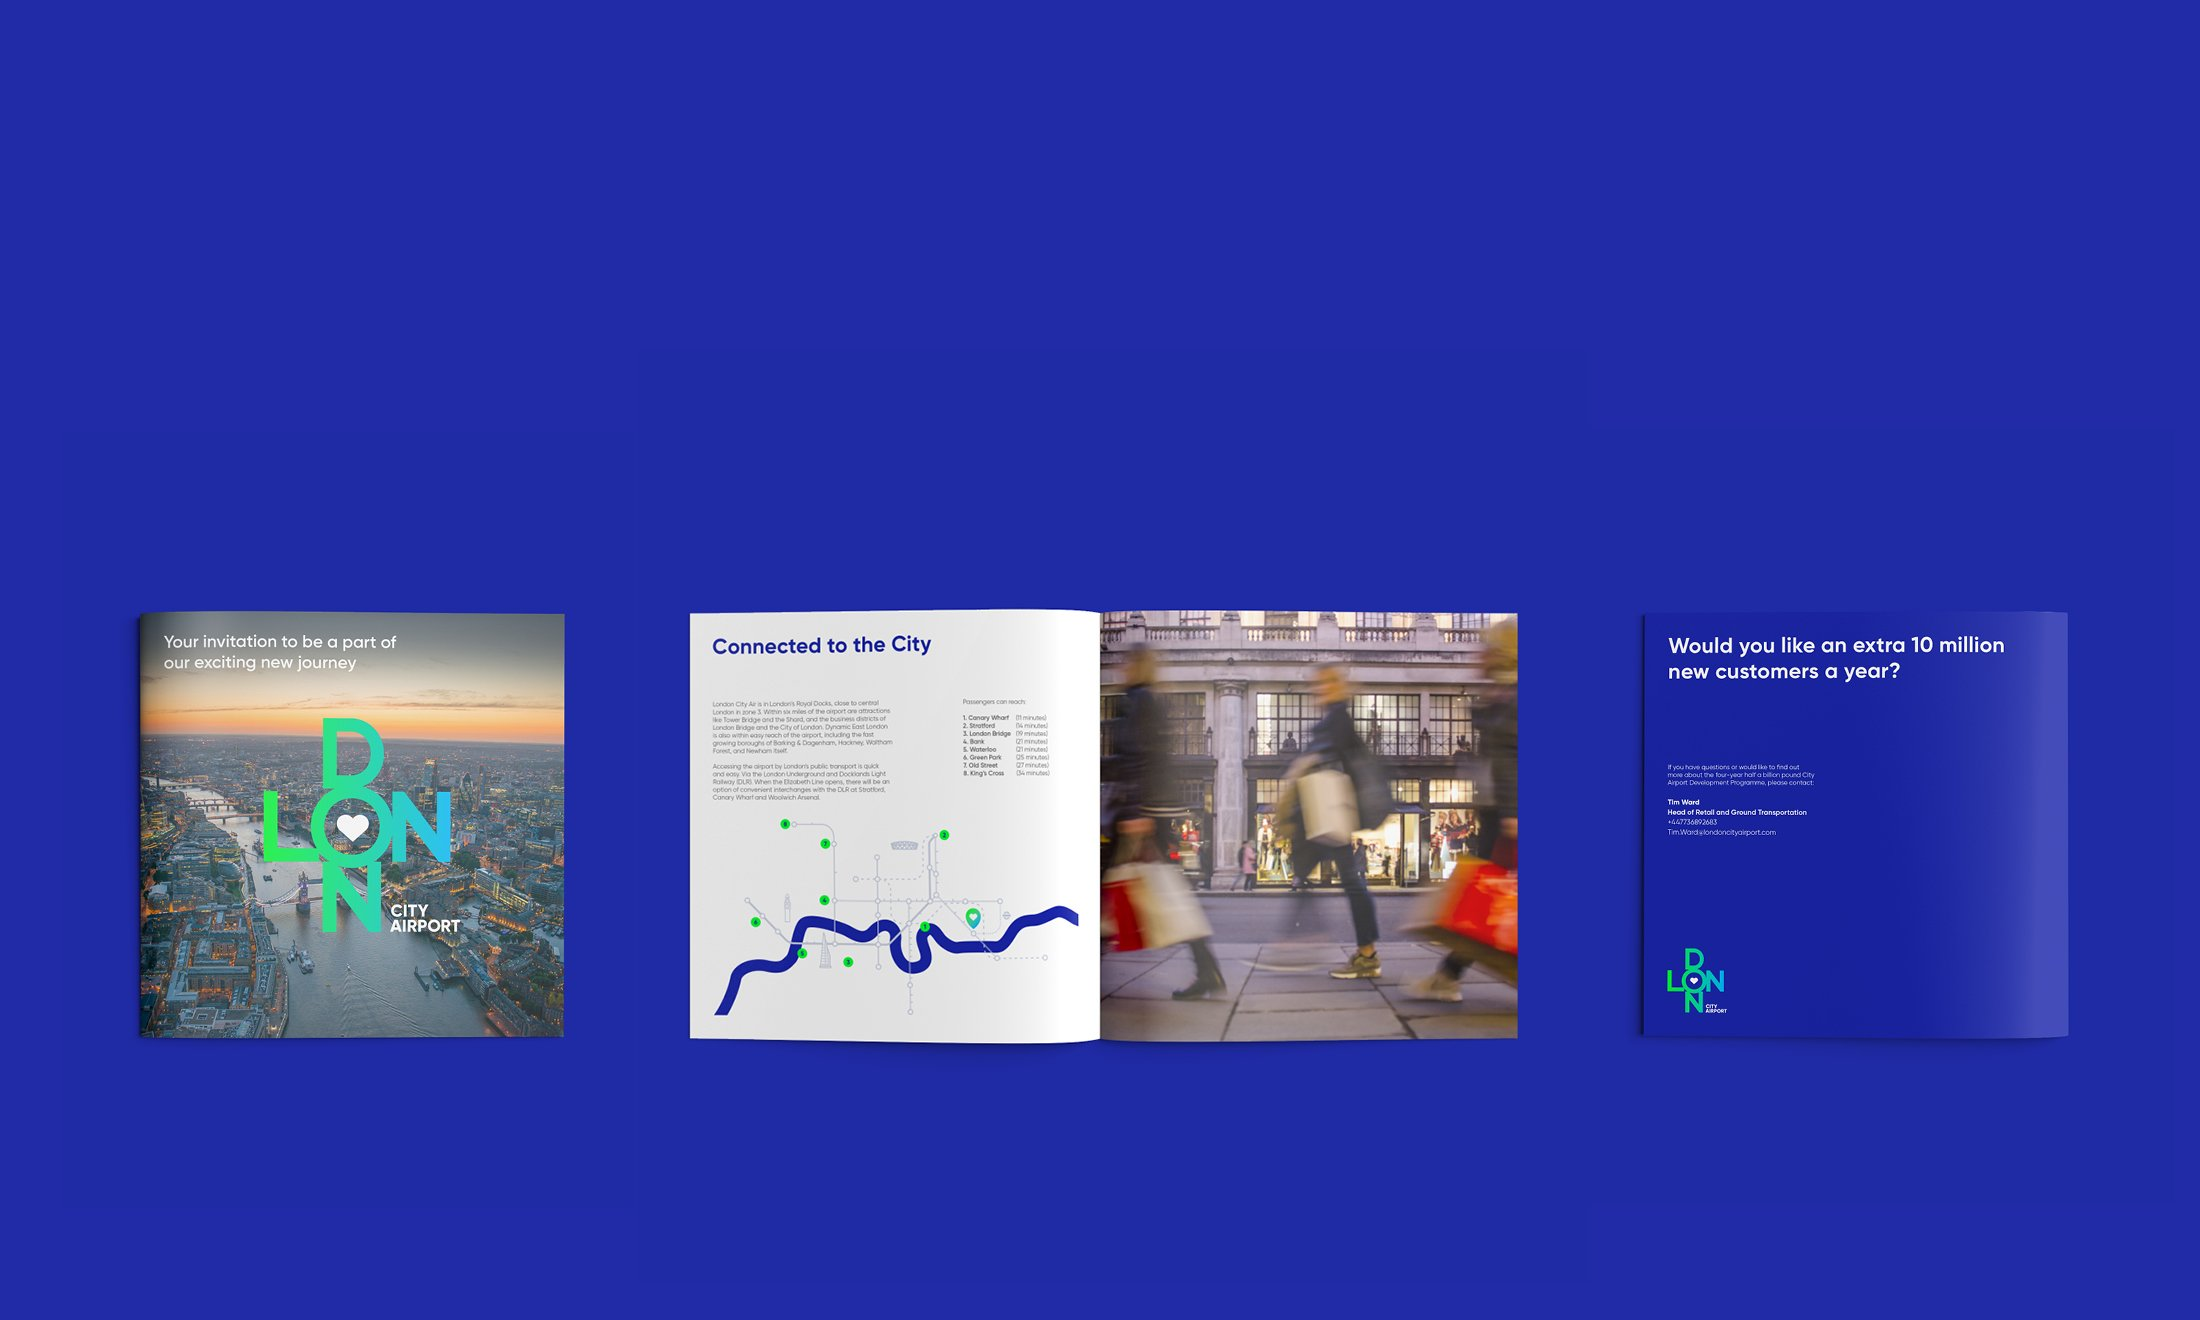 London City Airport B2B Marketing